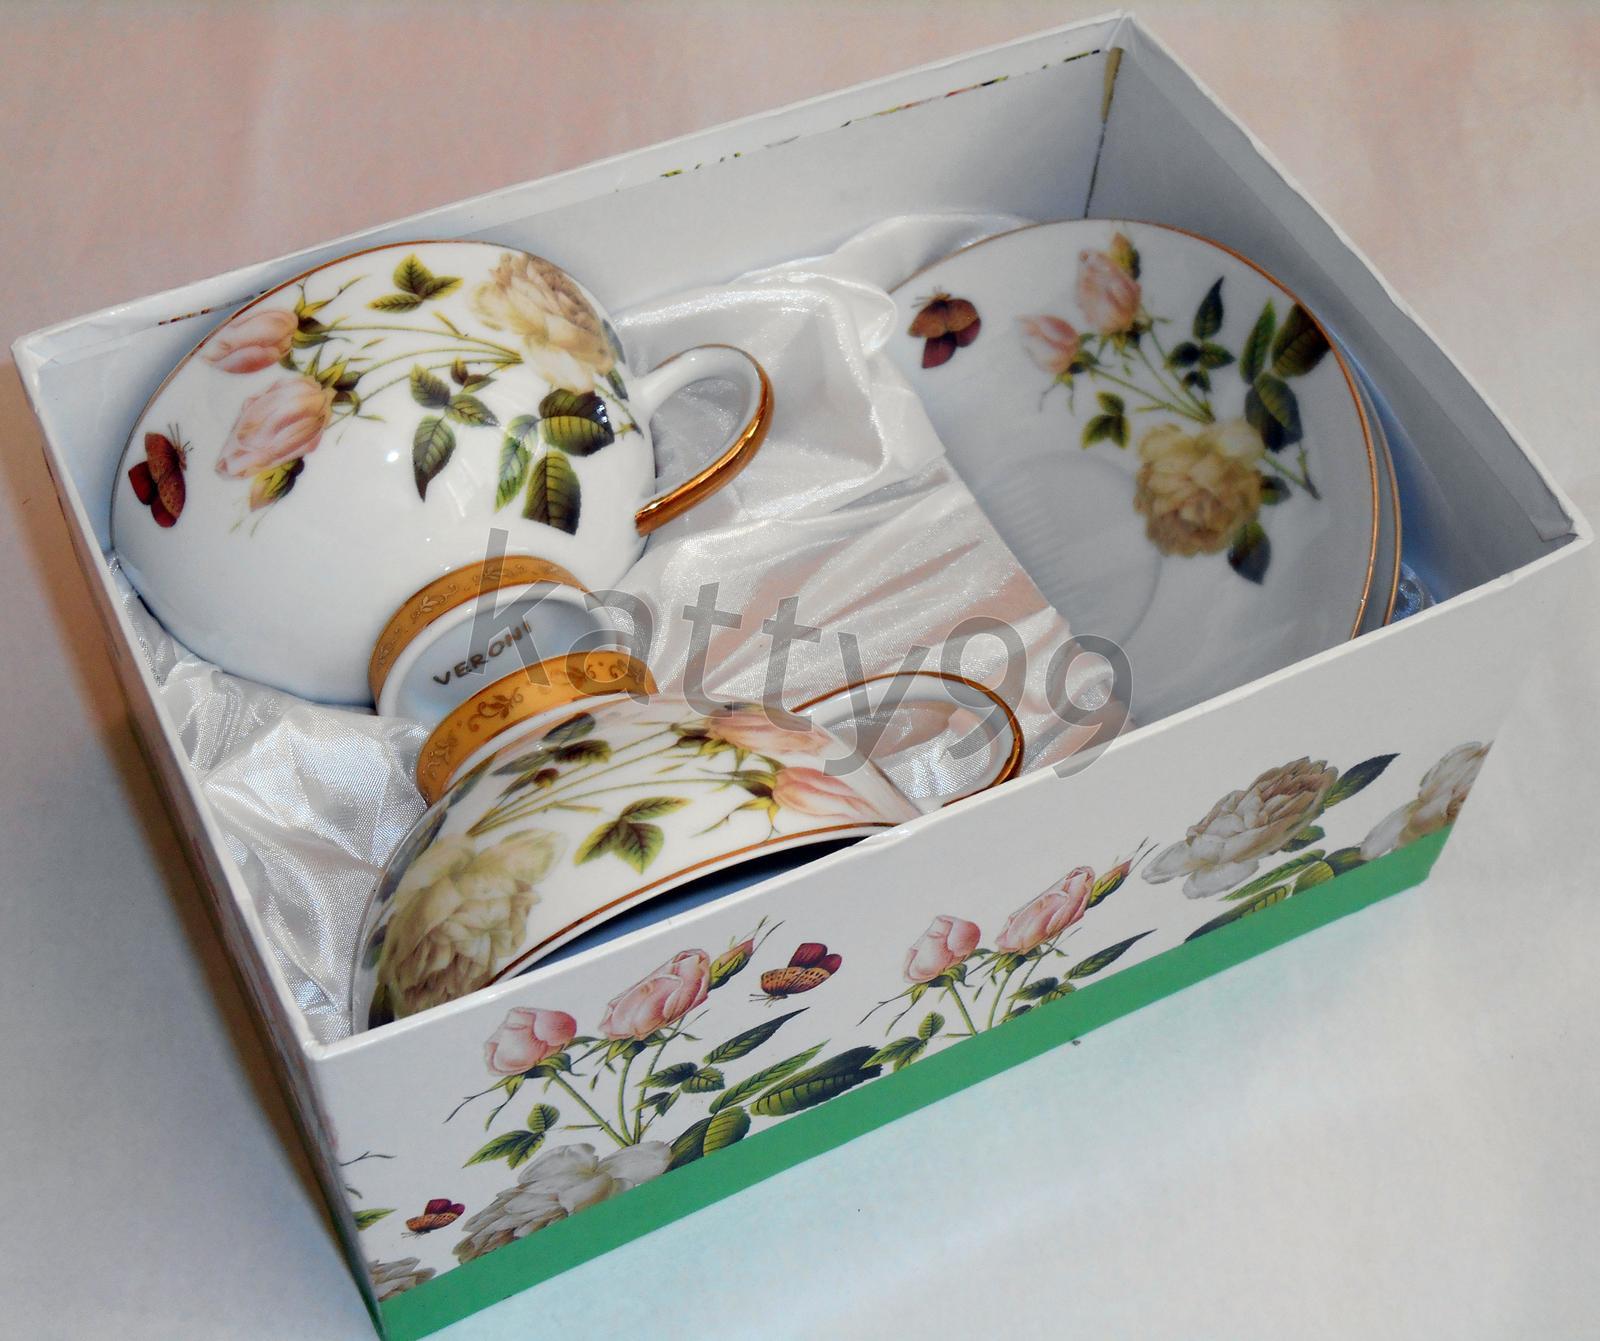 Úžitkové porcelánové šálky - nerozbalené - Obrázok č. 1